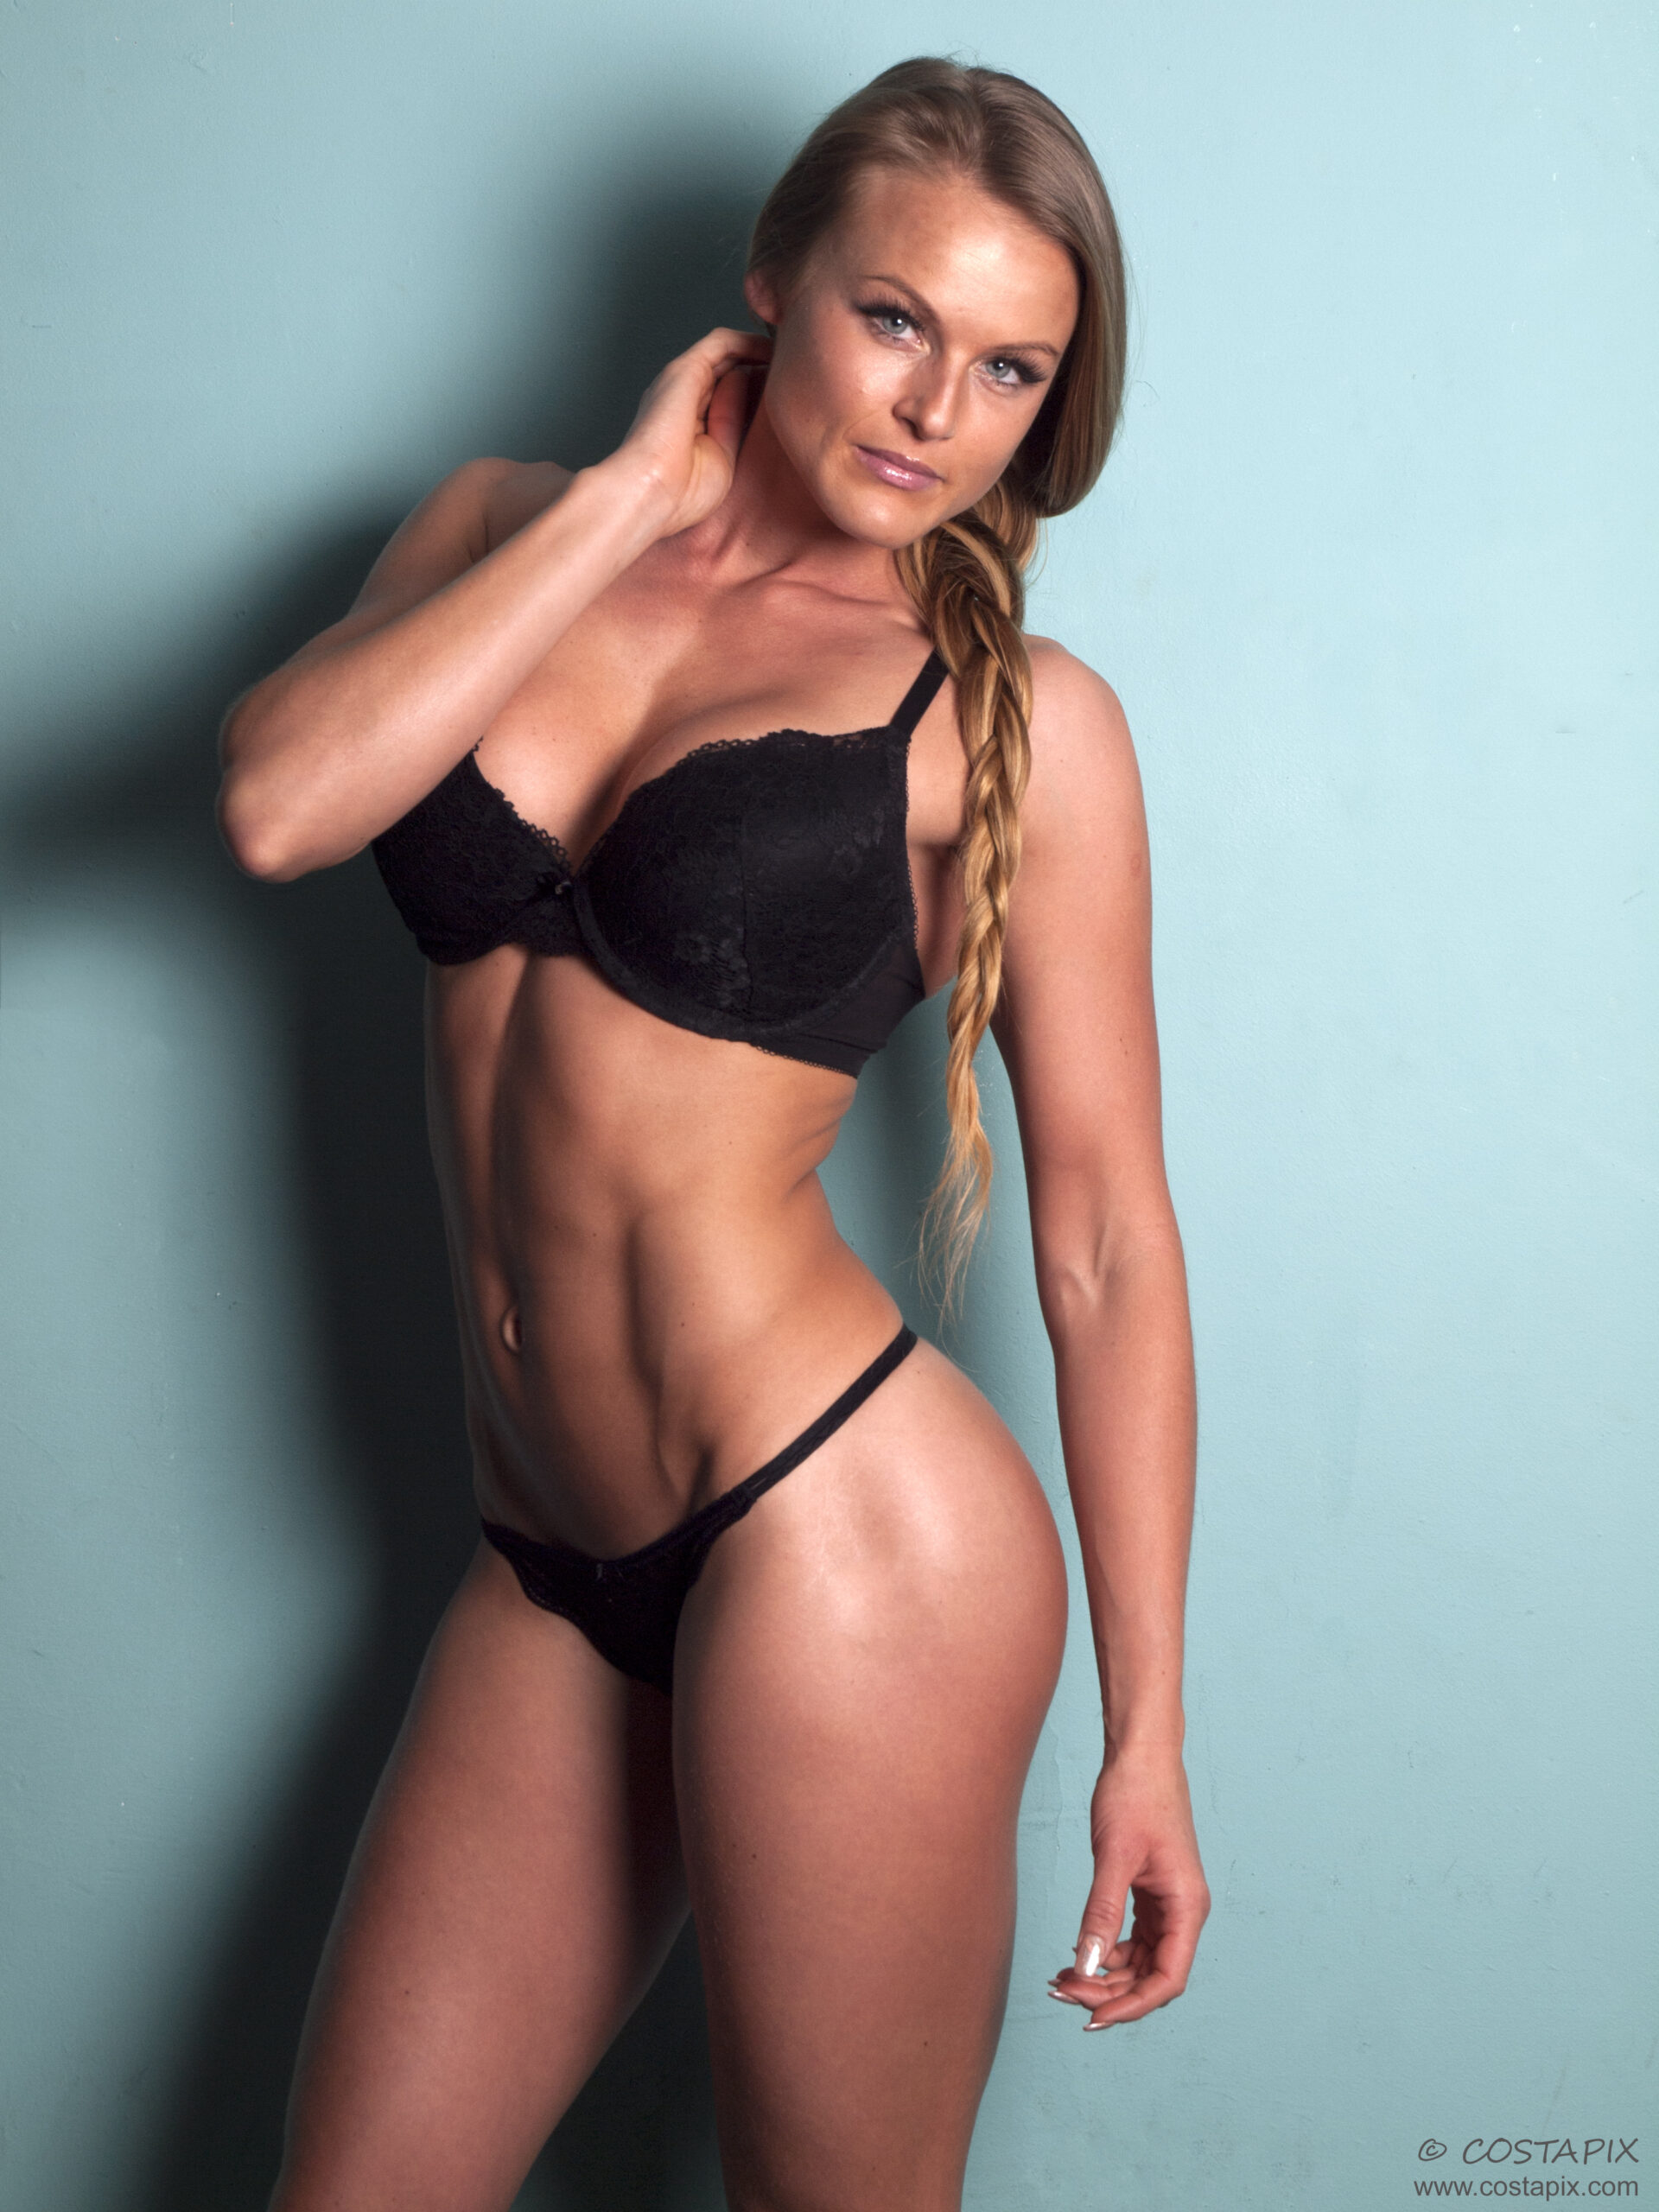 Evita Breide IFBB Pro bikini in Costapix studio